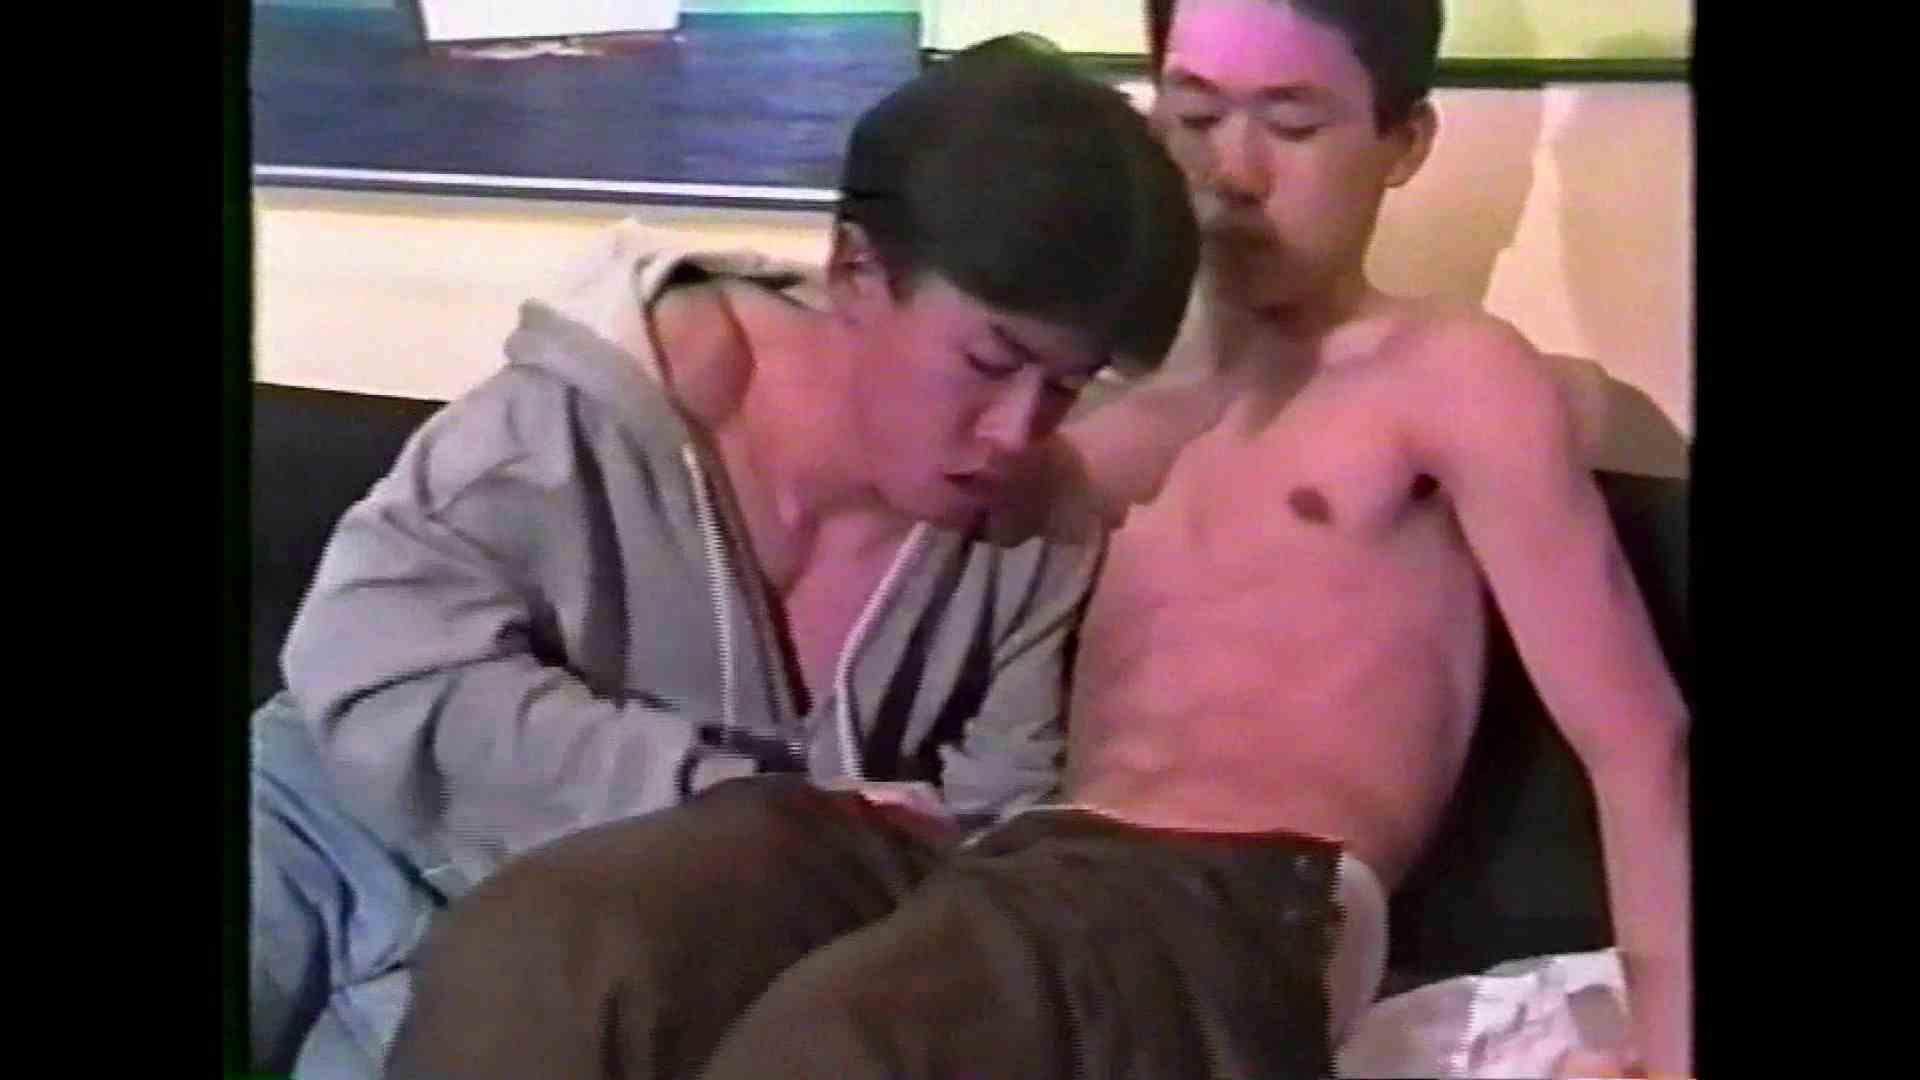 GAYBOY宏のオカズ倉庫Vol.2-1 フェラ ゲイAV画像 114枚 55